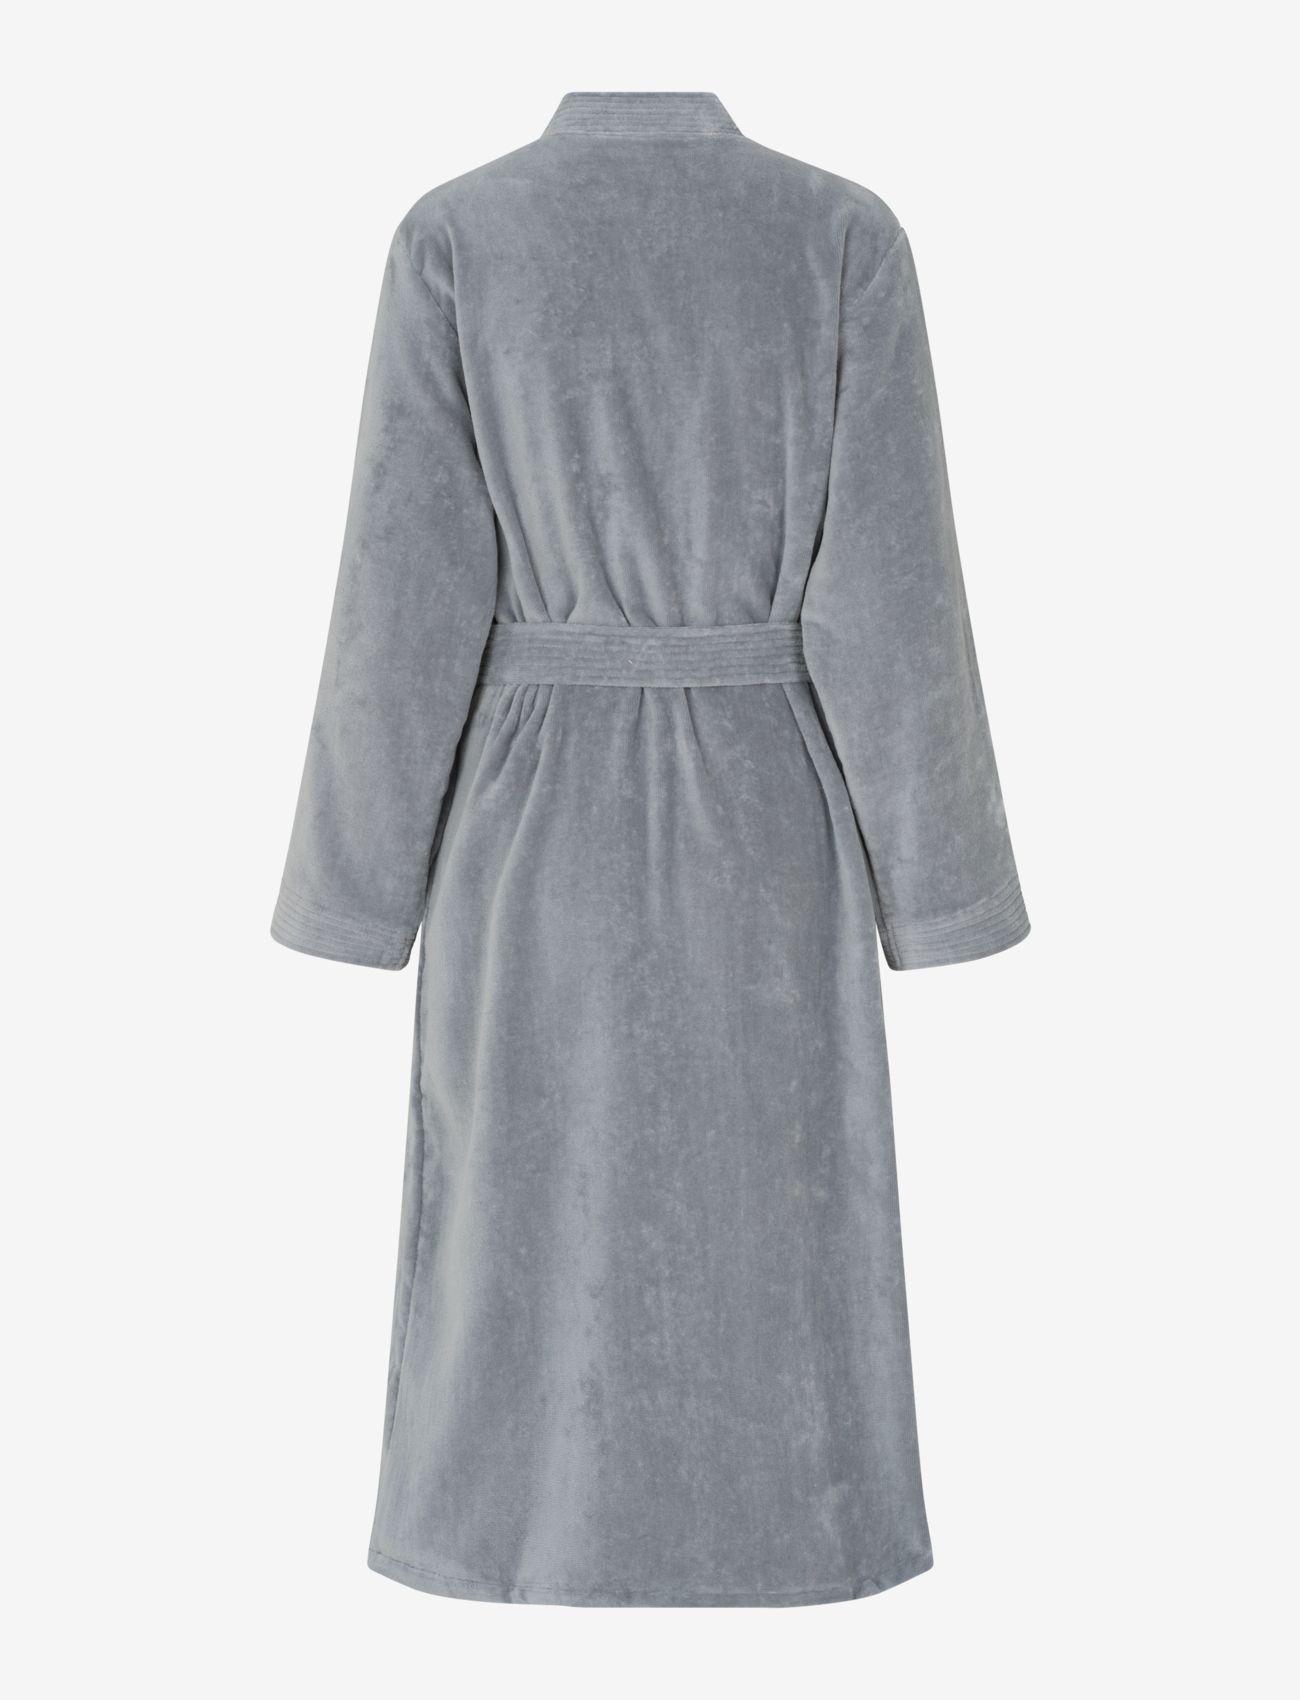 Rosemunde - robe - pegnoirs - charcoal grey - 1